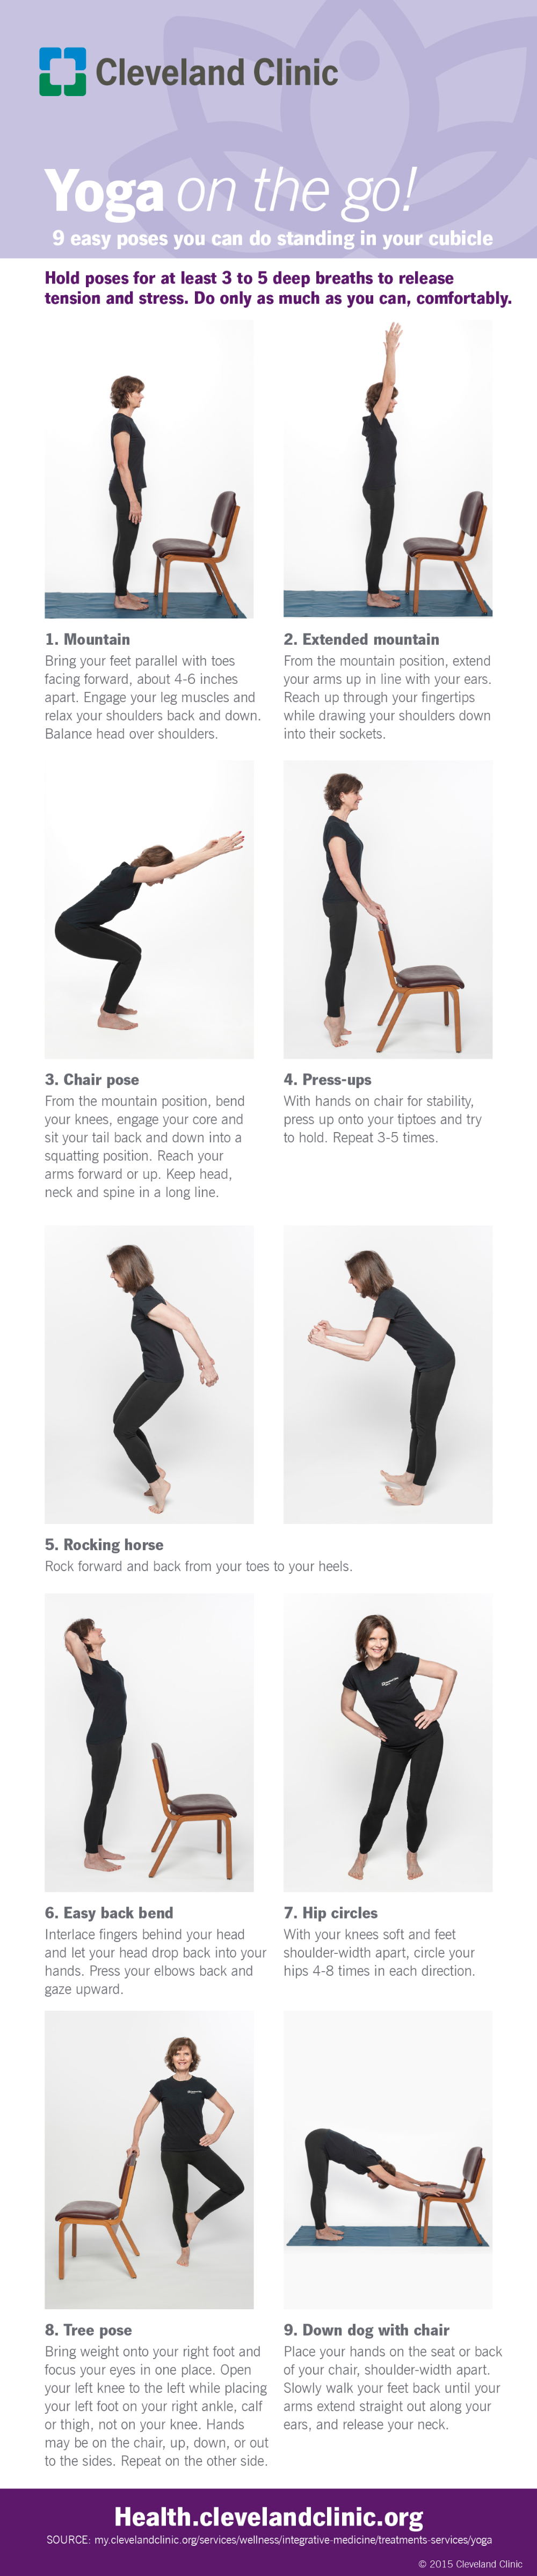 Google Image Result For Https 2rdnmg1qbg403gumla1v9i2h Wpengine Netdna Ssl Com Wp Content Uploads Sites 3 2 Standing Yoga Poses Desk Yoga Poses Standing Yoga